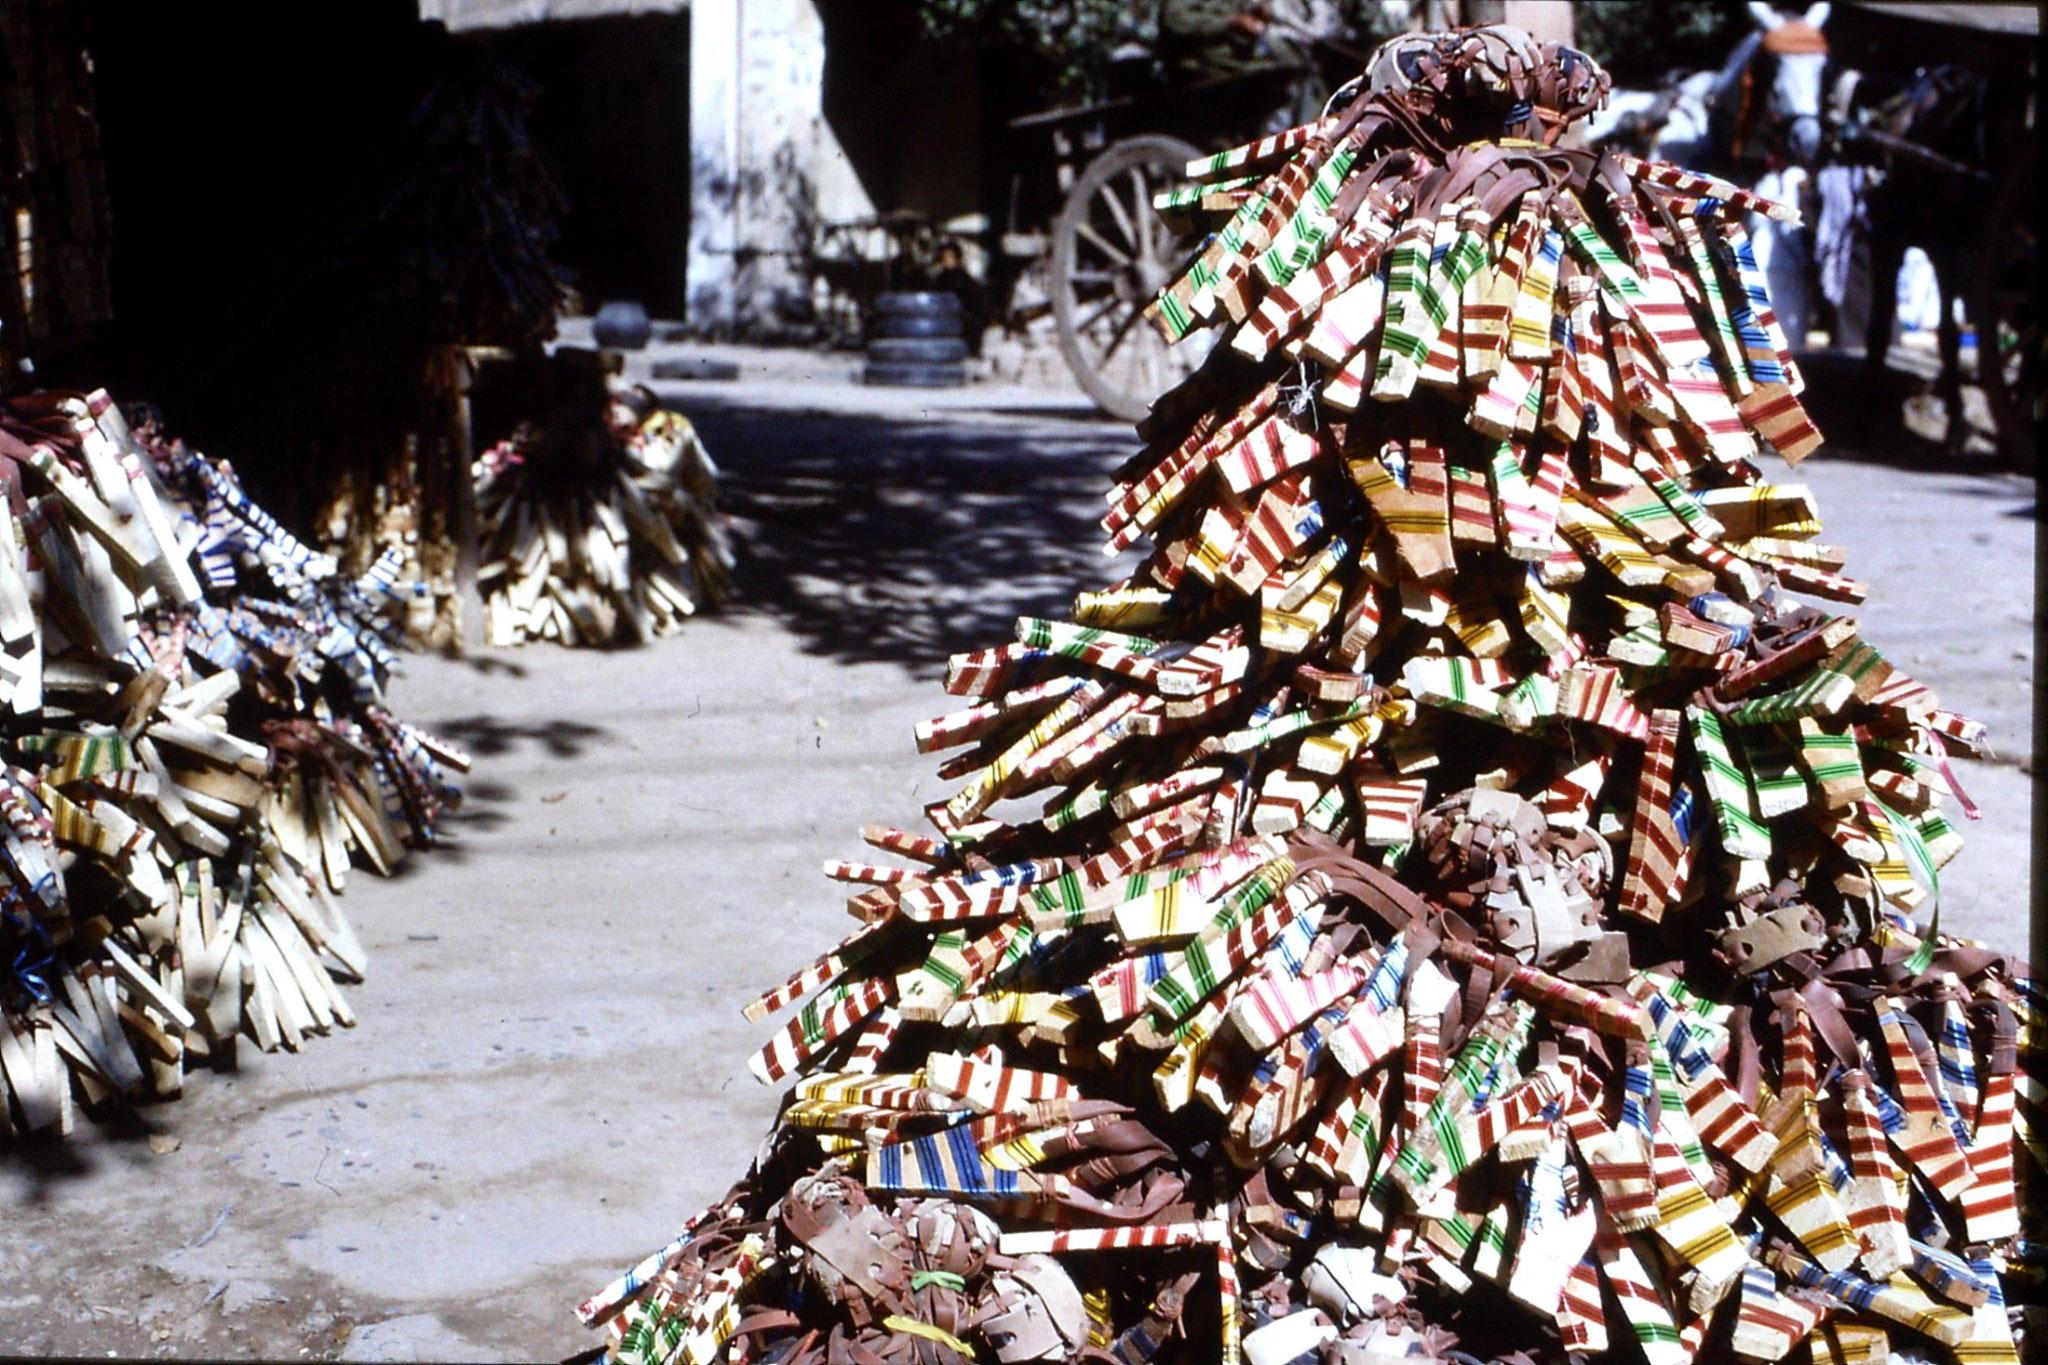 5/11/1989: 15: Peshawar, catapults